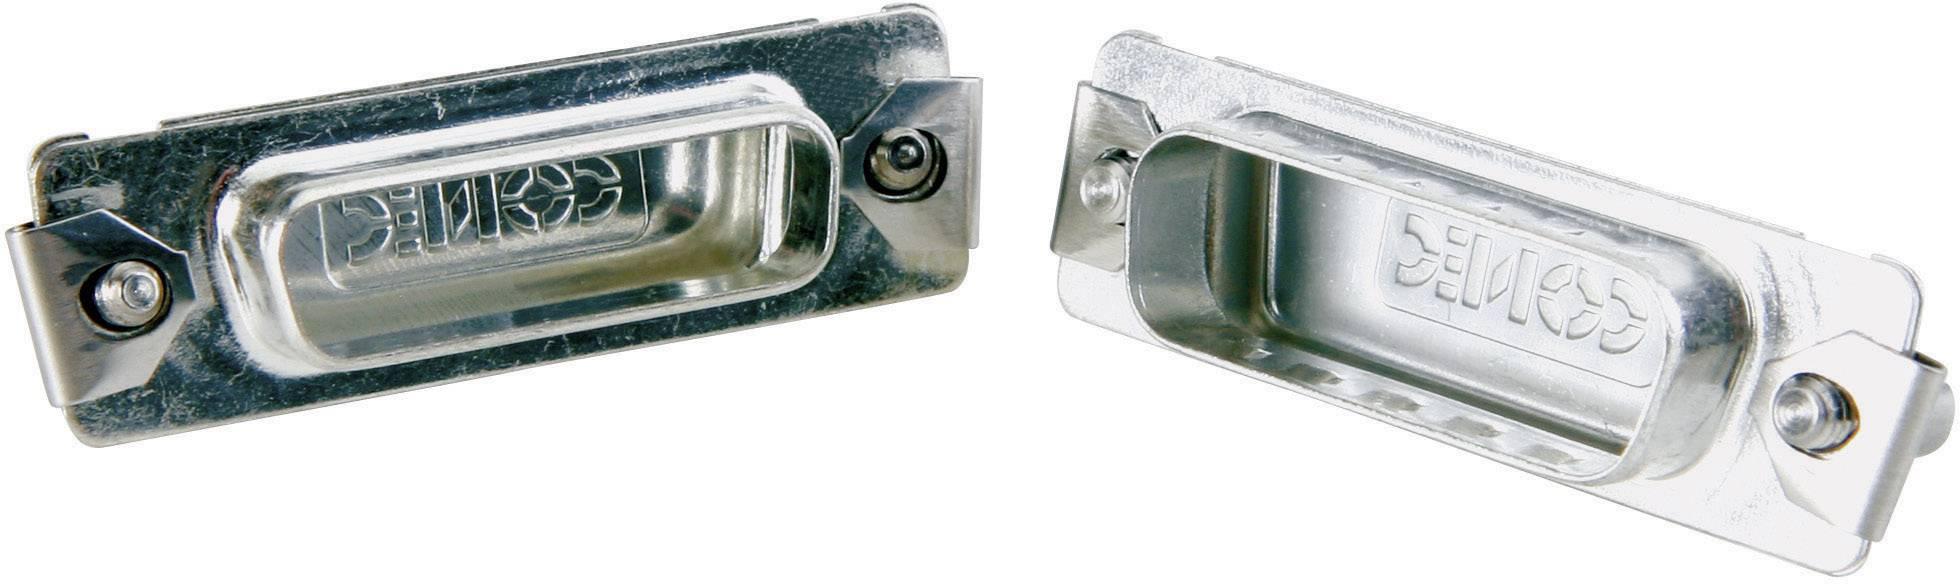 Záslepka D-SUB konektoru Conec 165X16809X pro 50pólovou D-SUB kolíkovou lištu, stříbrná, 1 ks